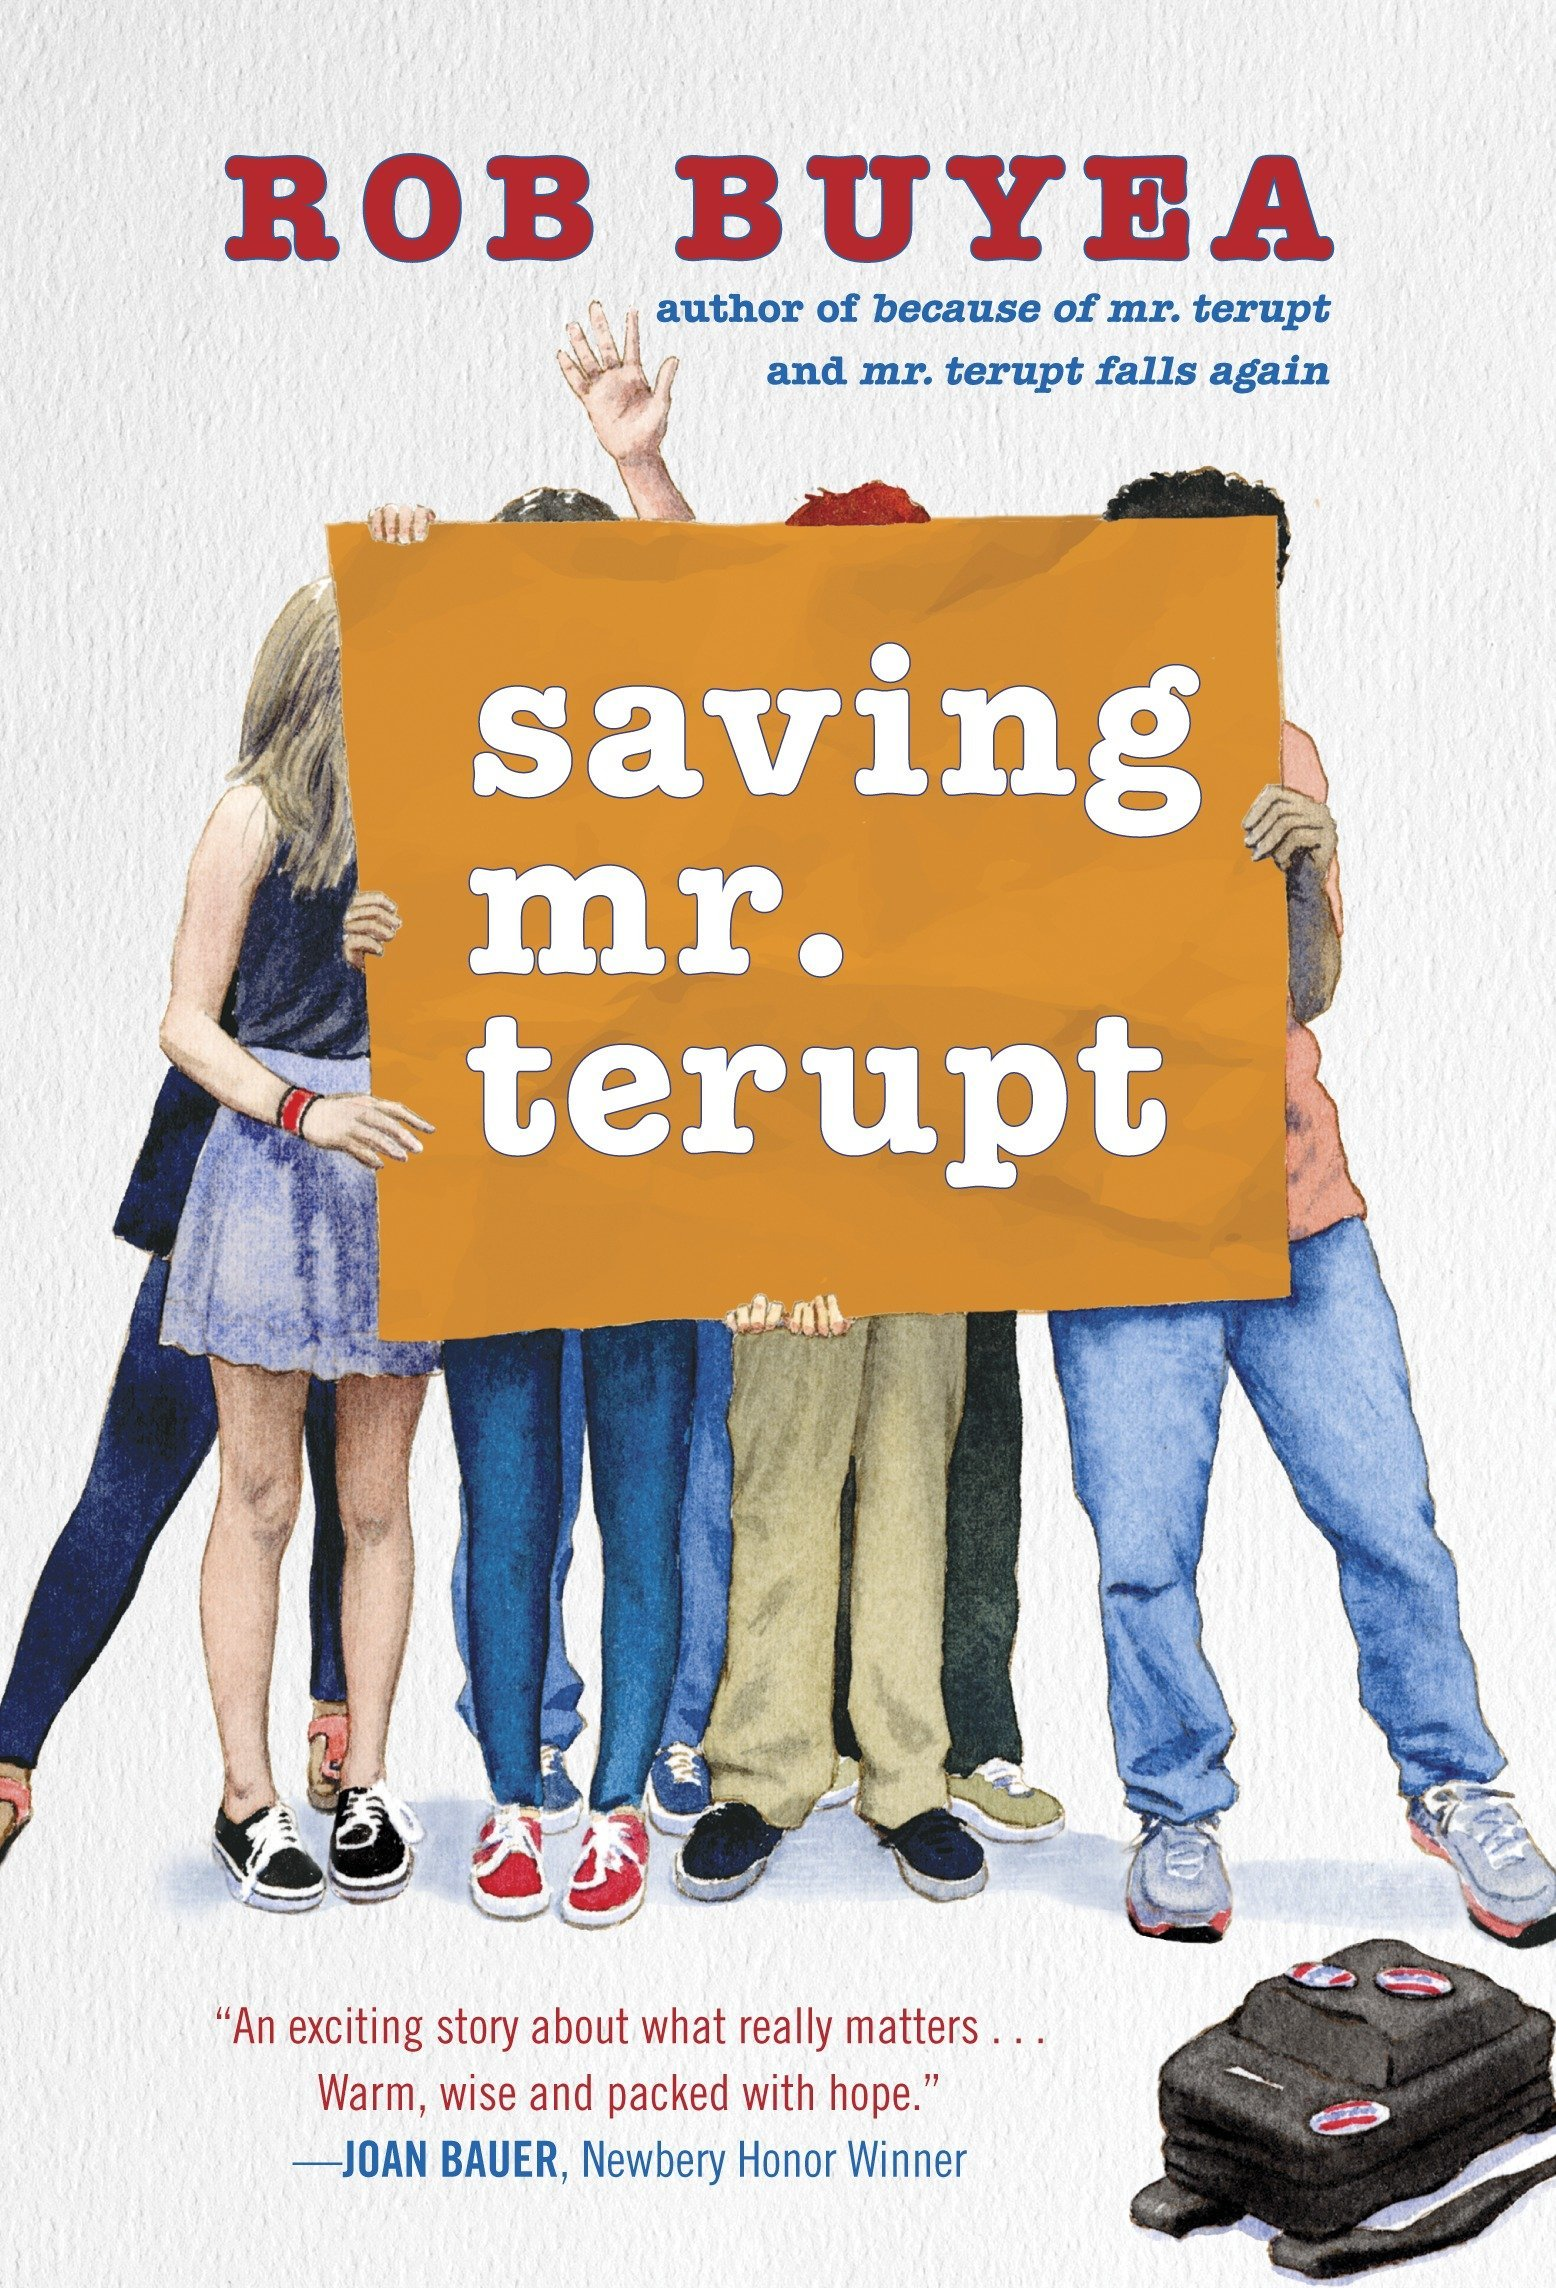 MR TERUPT FALLS AGAIN PDF DOWNLOAD